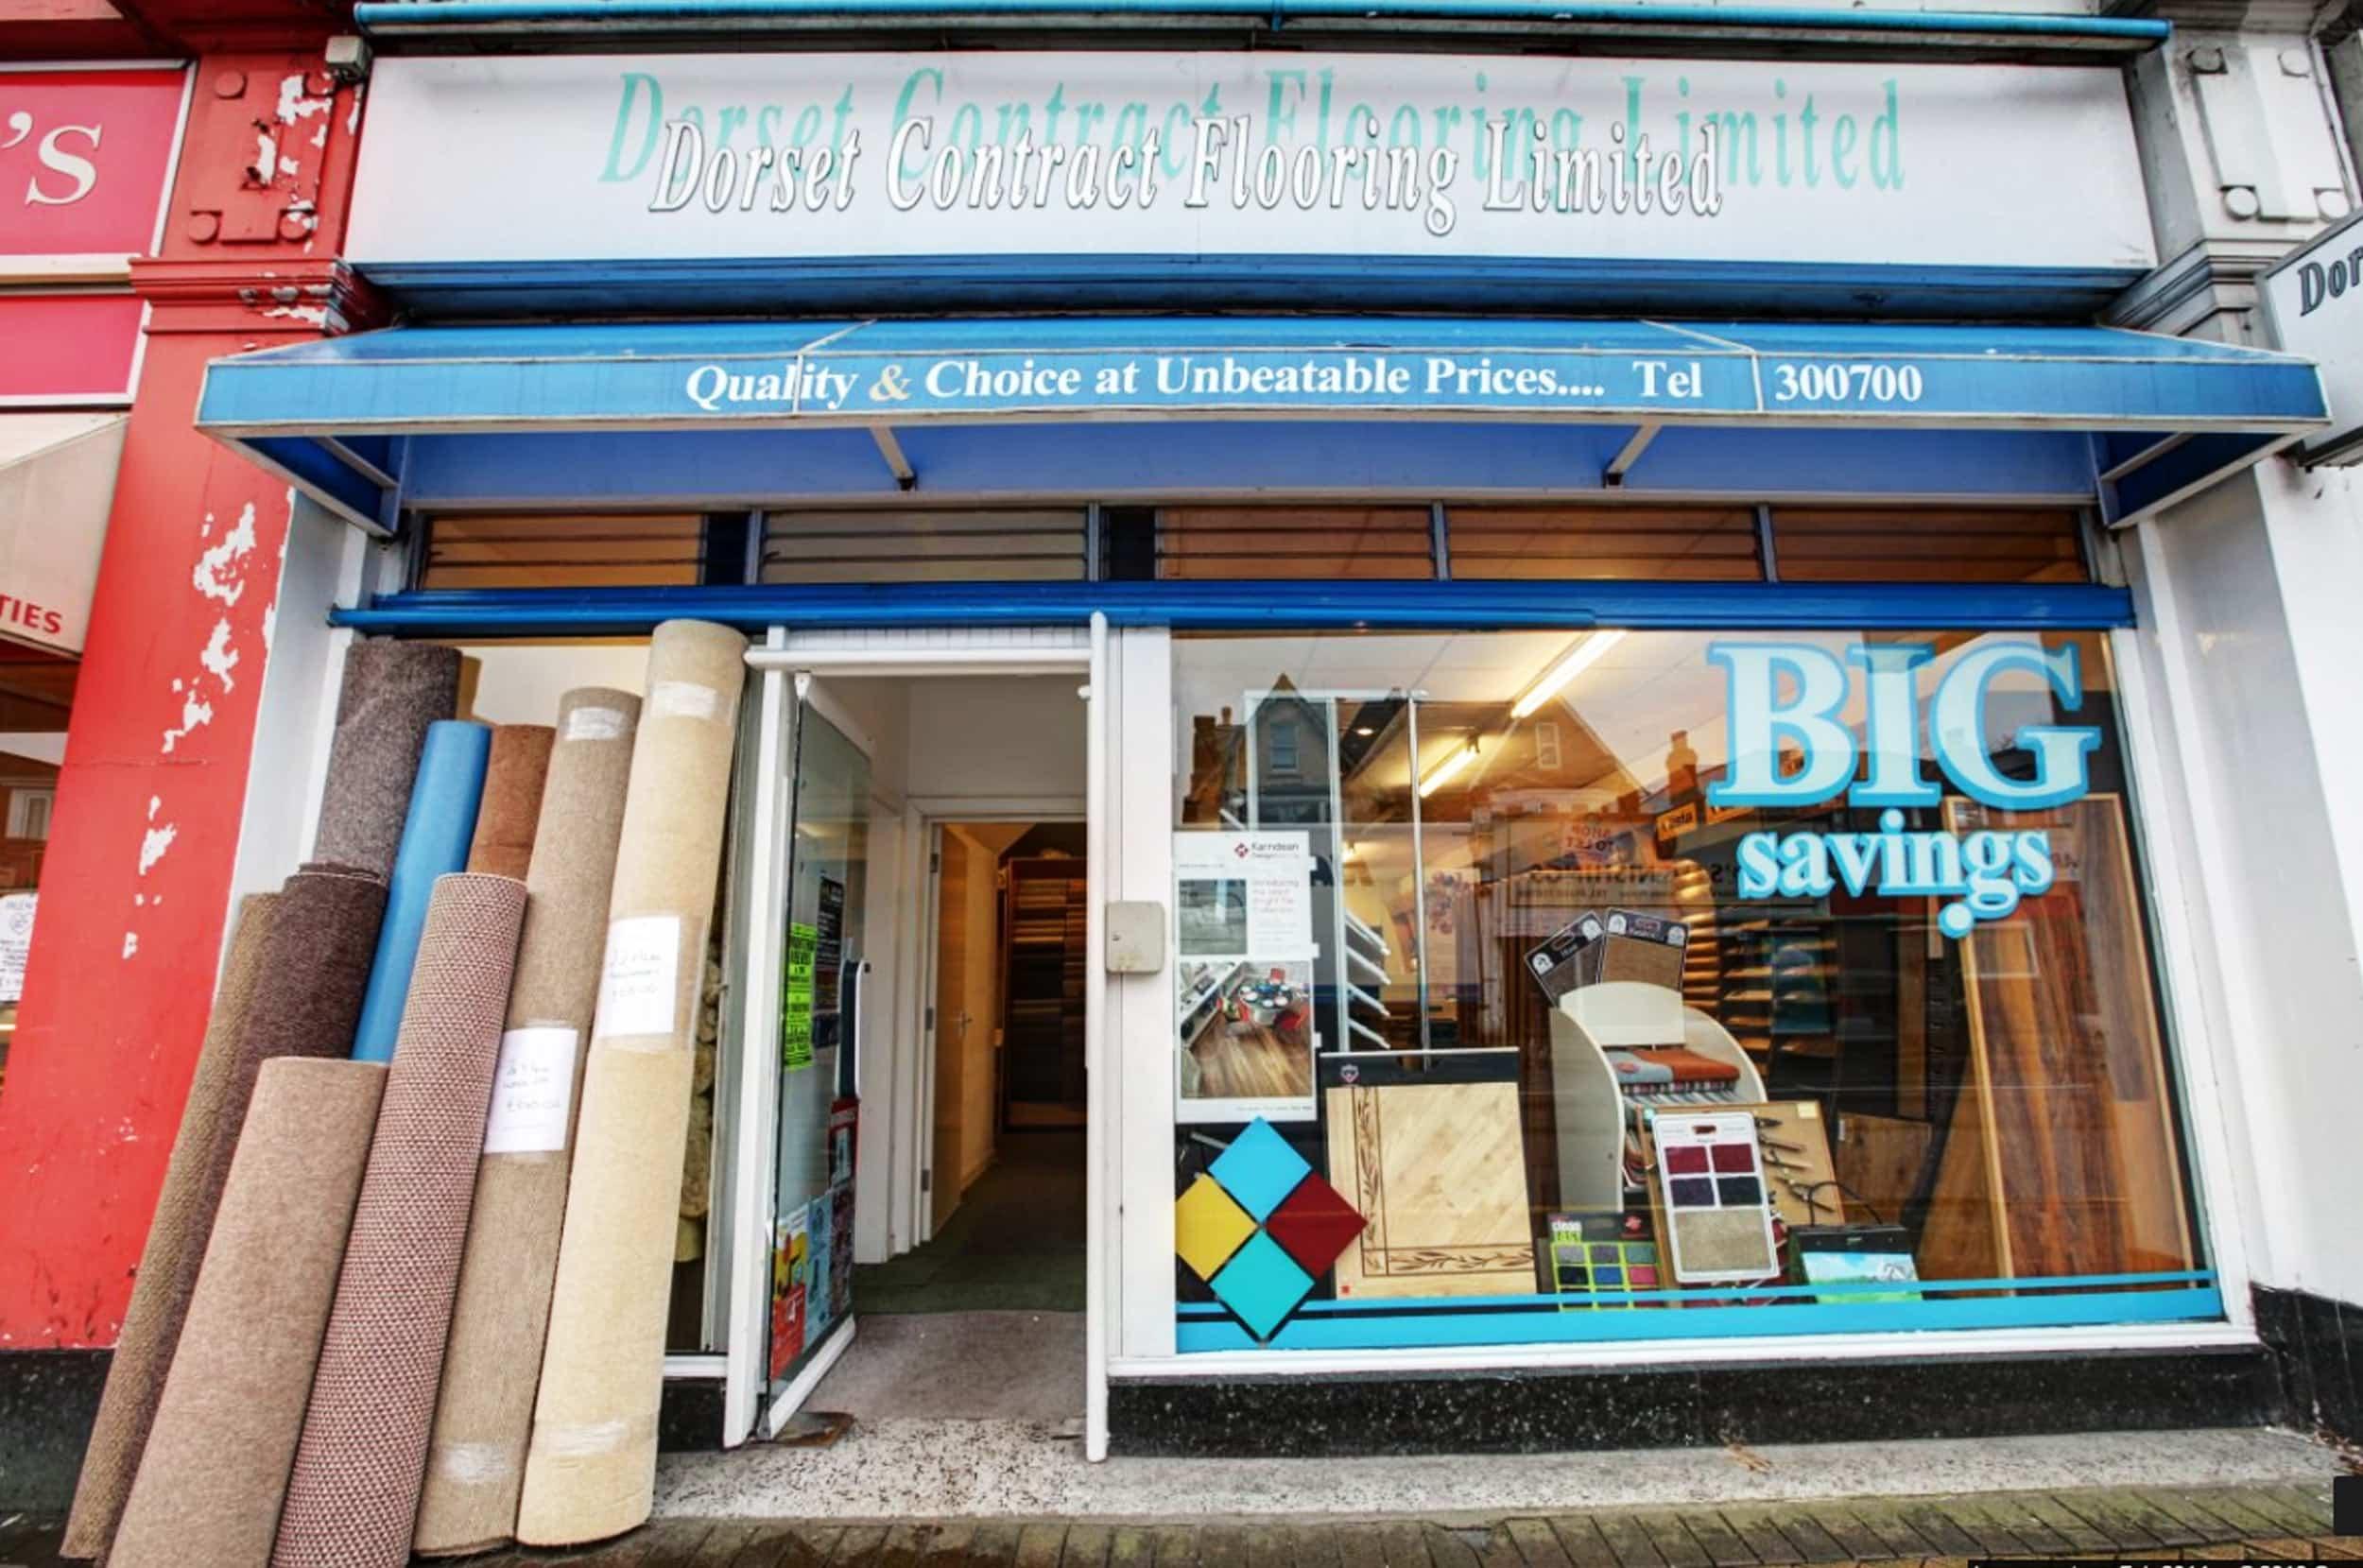 Dorset Flooring Bournemouth shop front